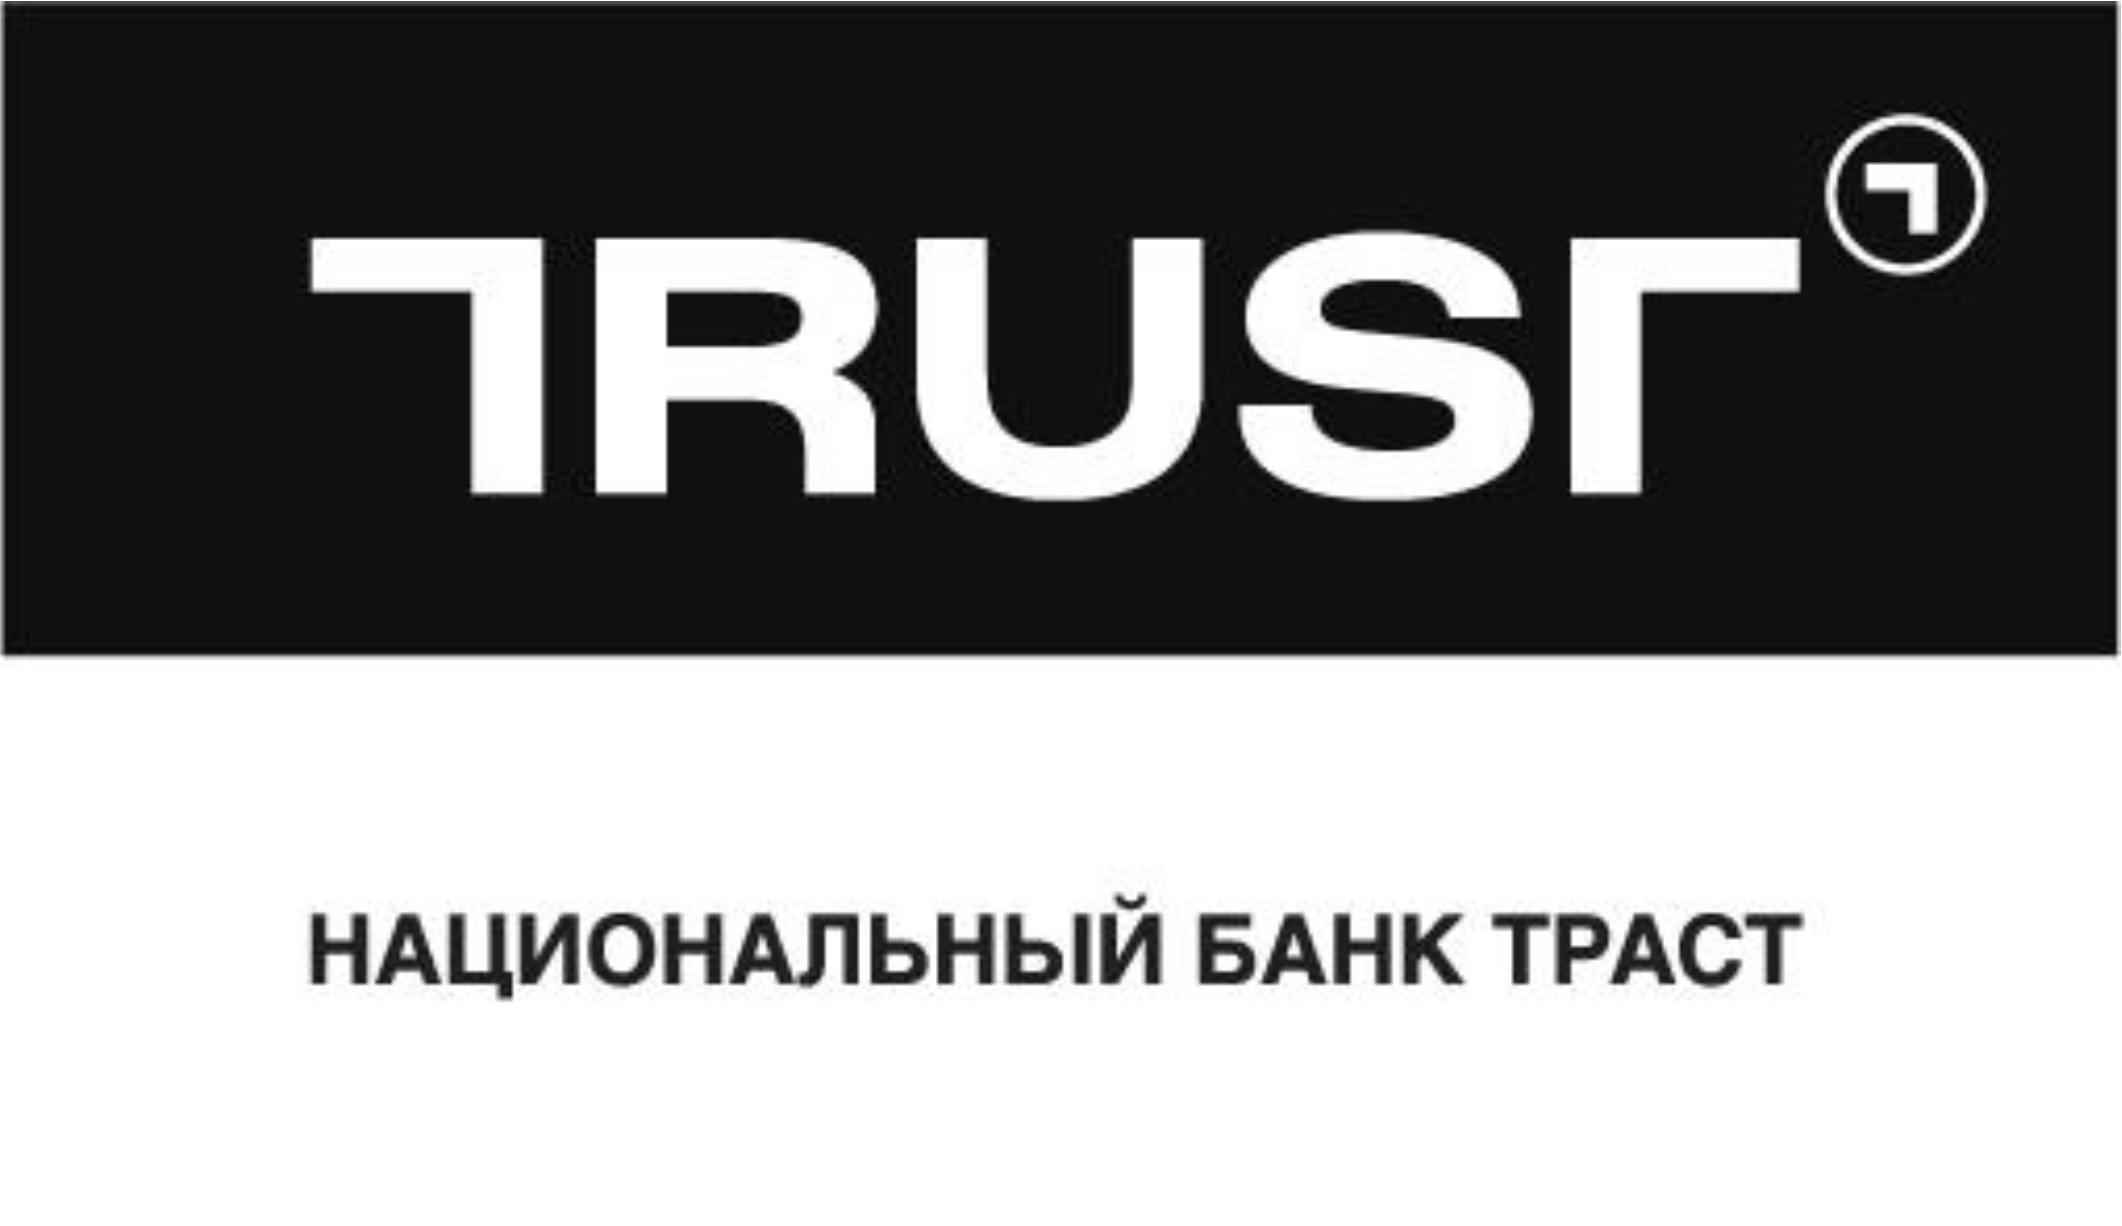 Банк транс южно сахалинск